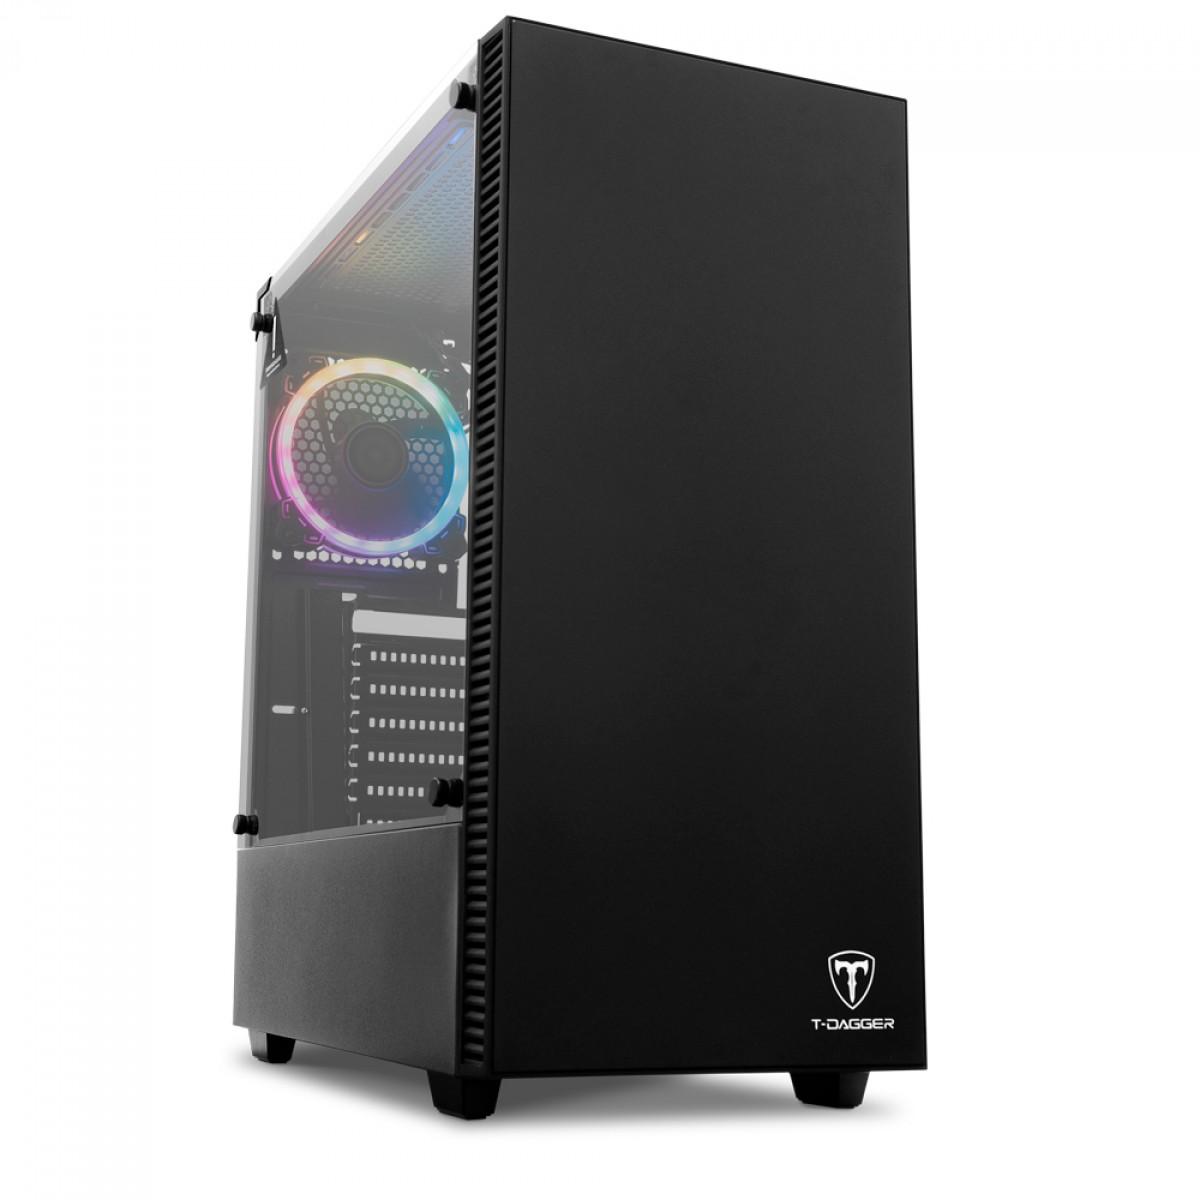 Computador Gamer, RYZEN 5 2400G, Placas de Vídeo Radeon Vega 11, 8GB DDR4, HD 1TB